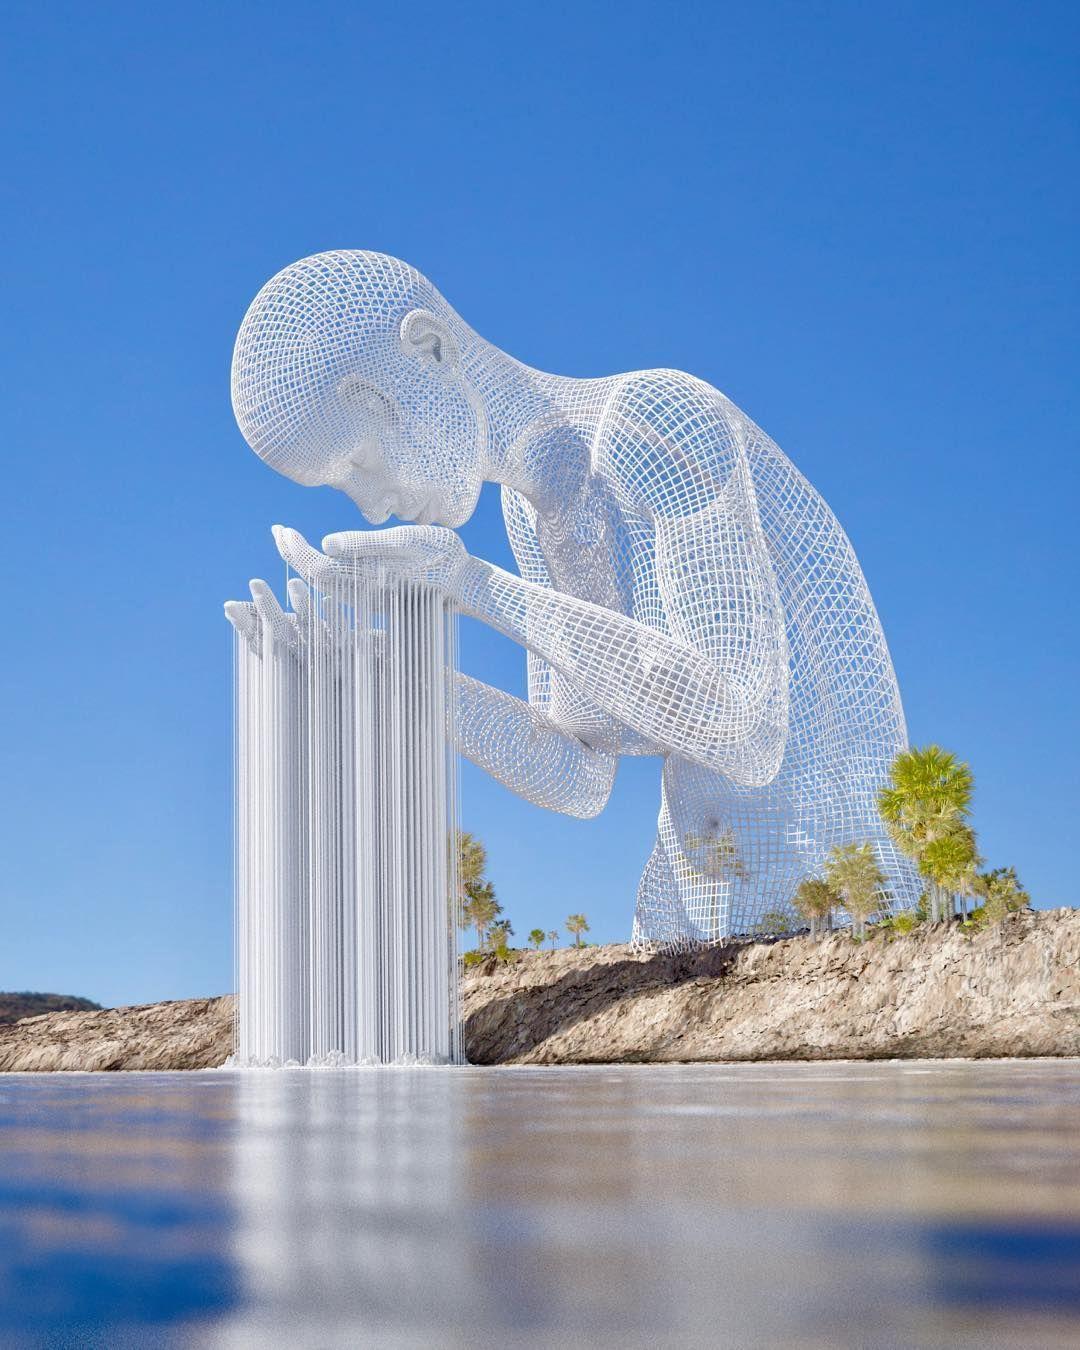 karya seni rupa 3 dimensi yang berfungsi sebagai benda